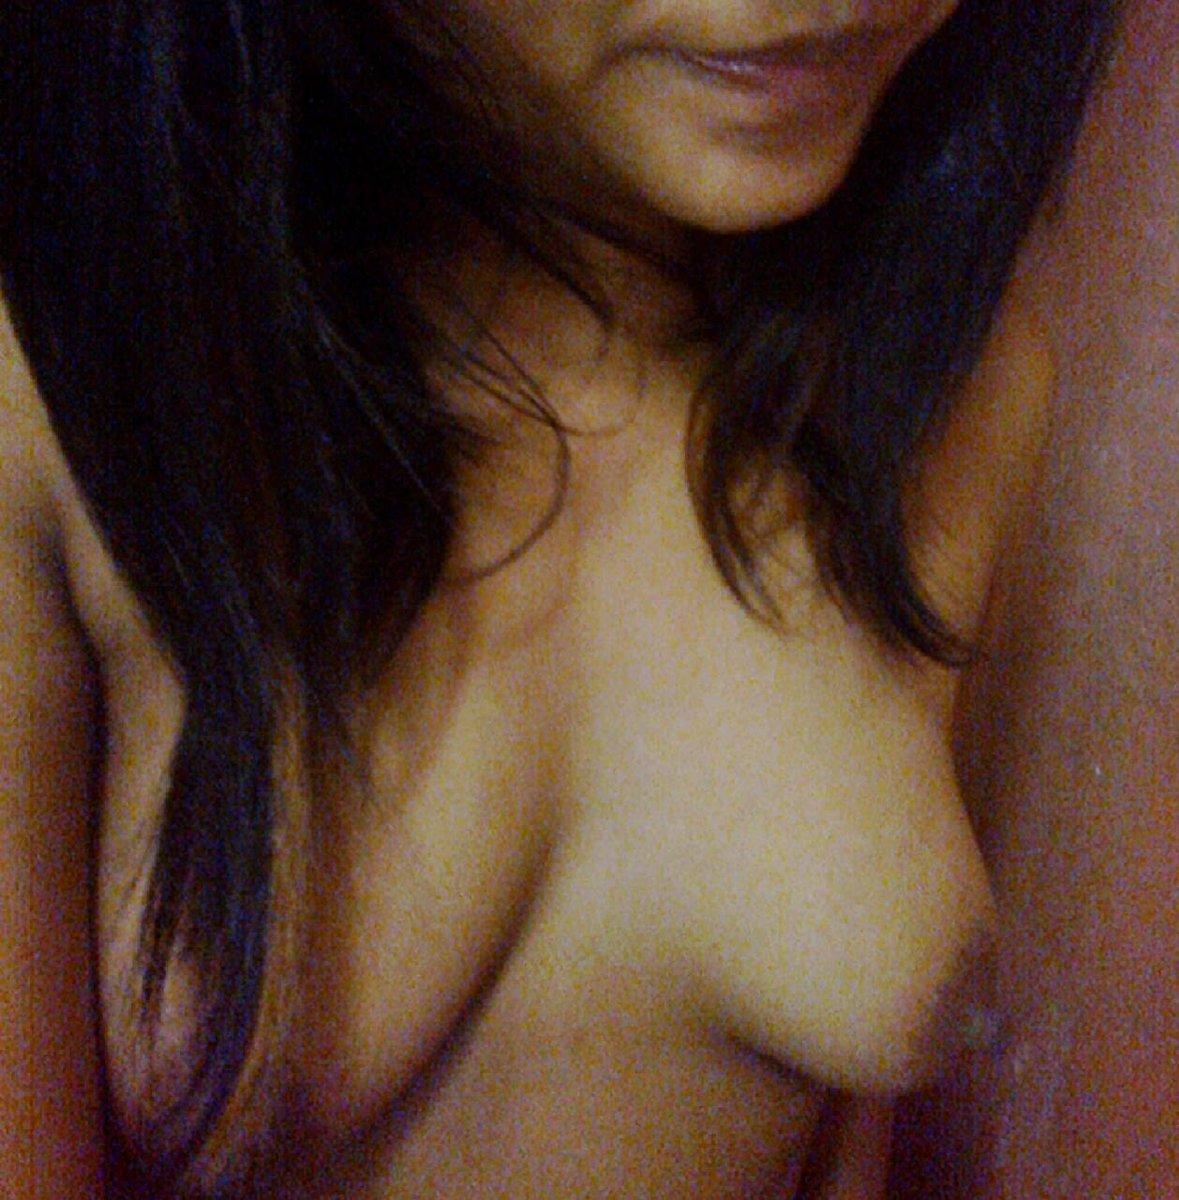 Nude Selfie 7269